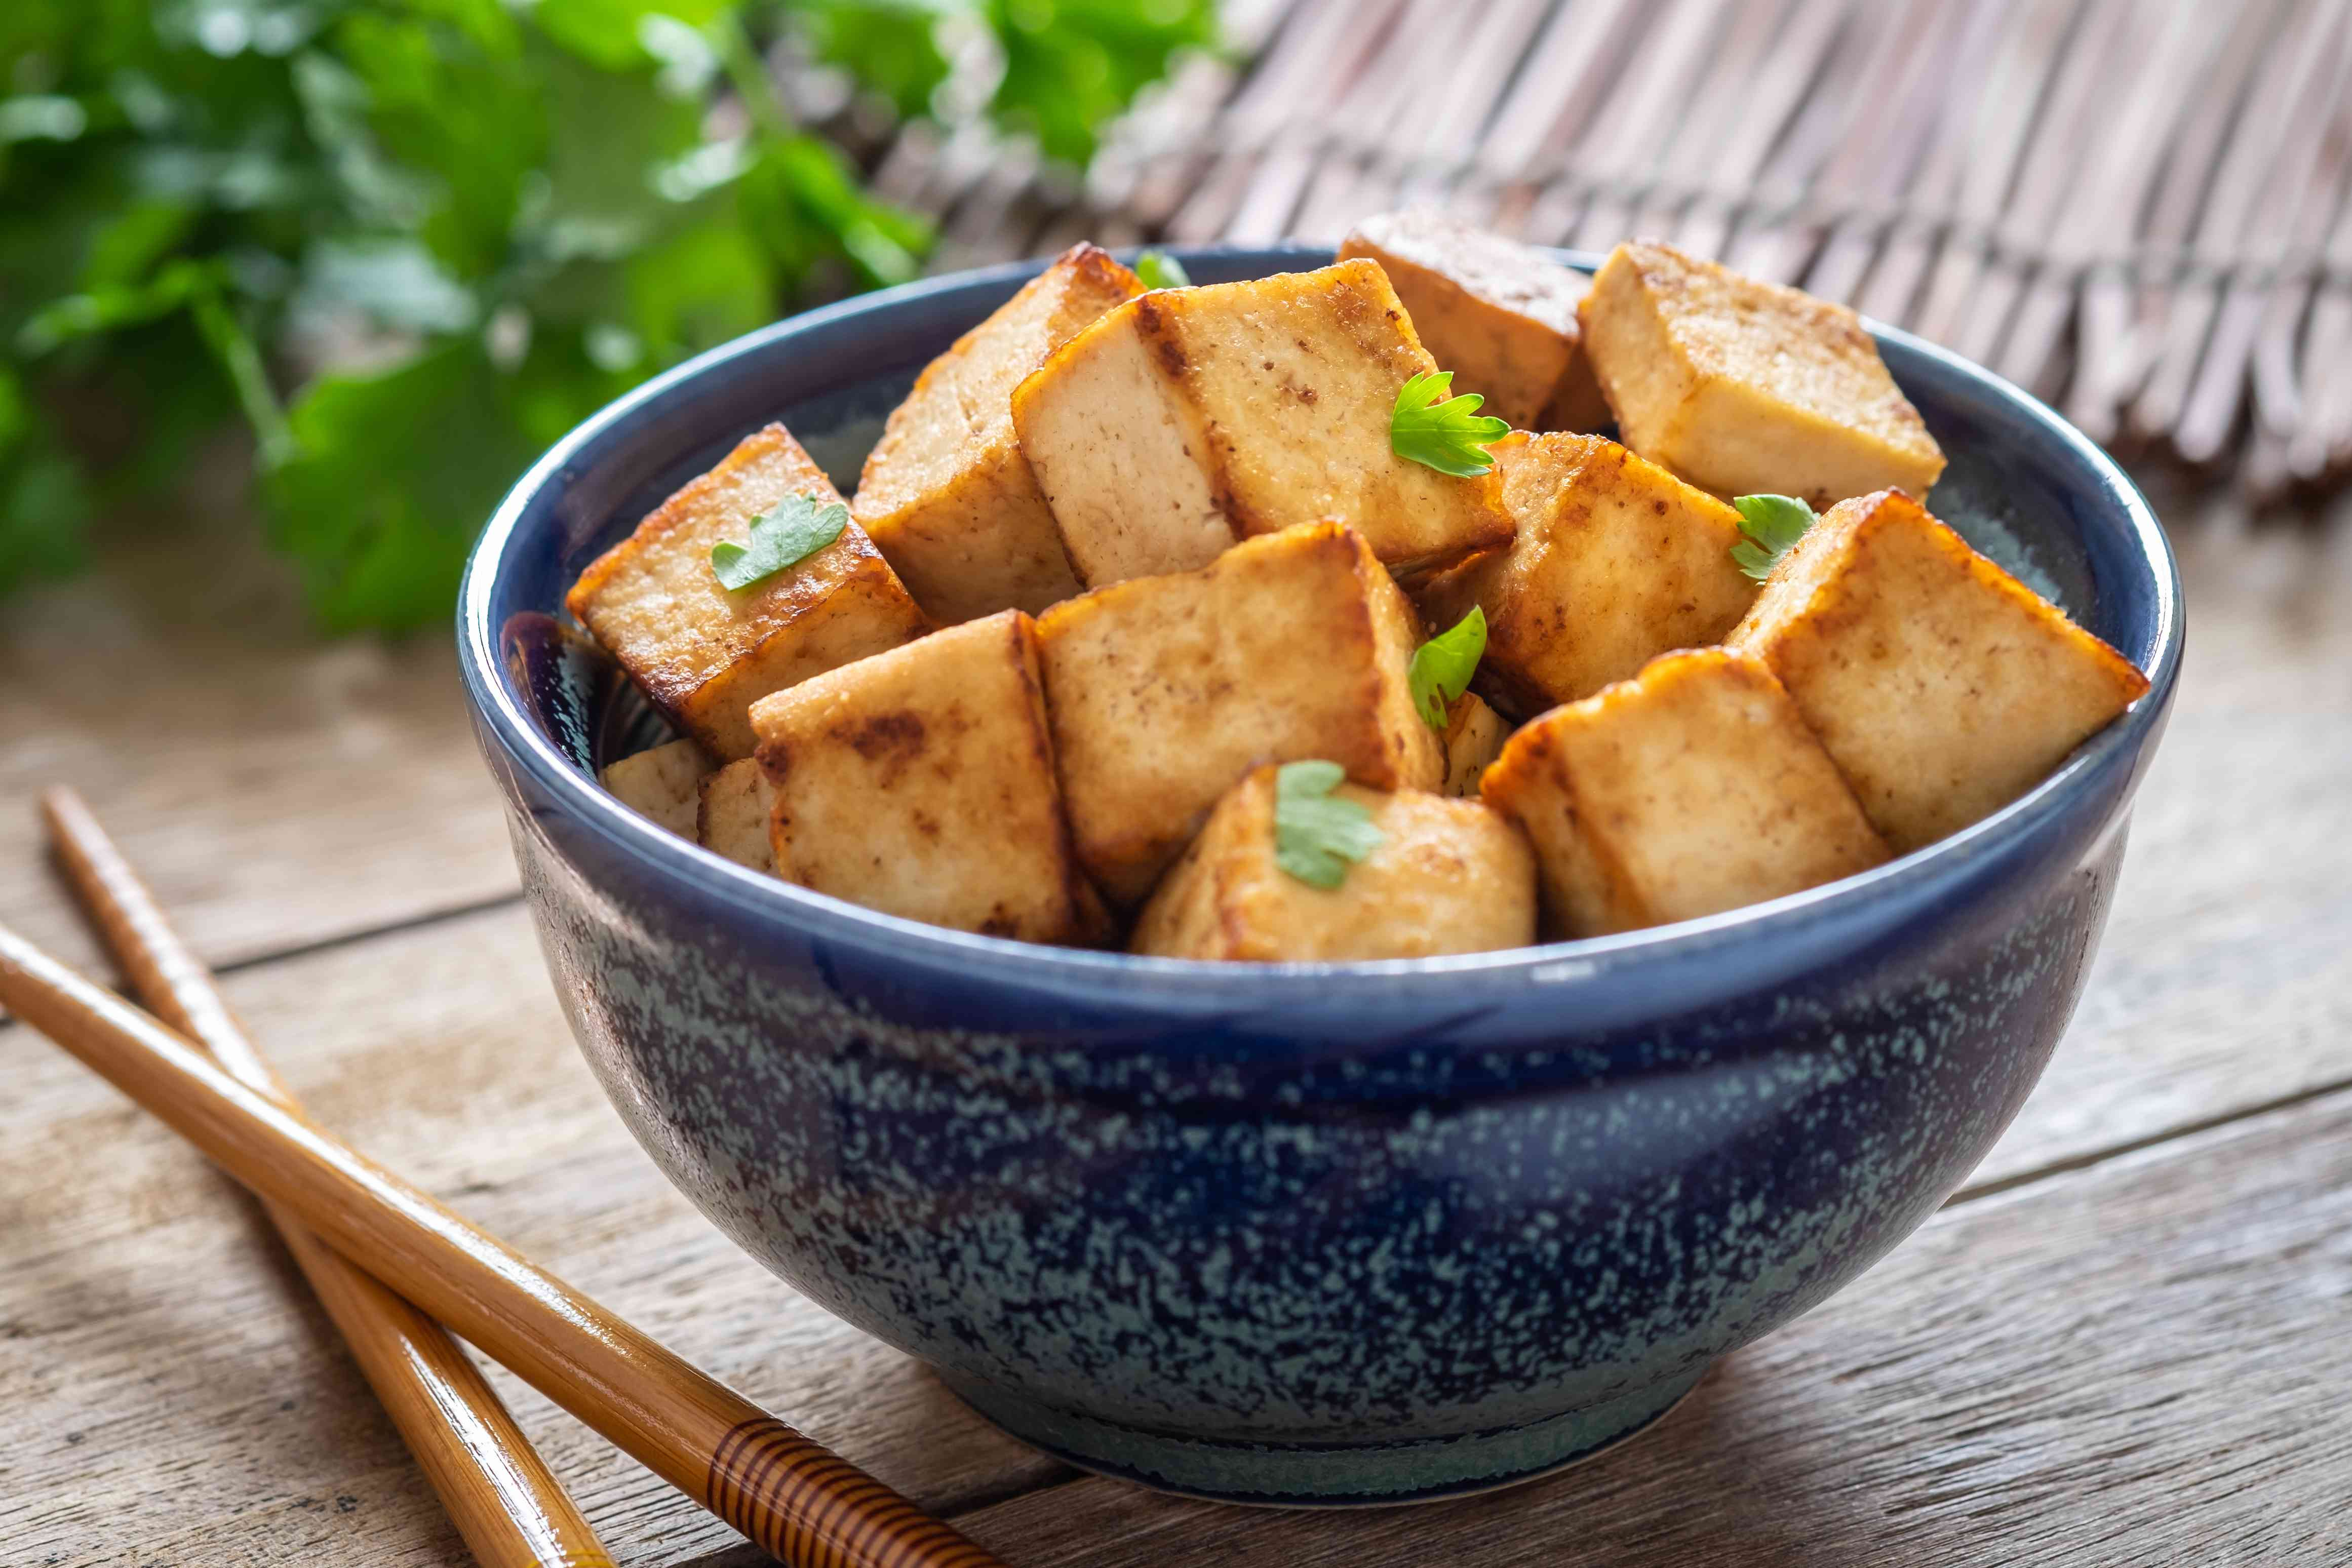 Fried tofu in bowl, Vegetarian food